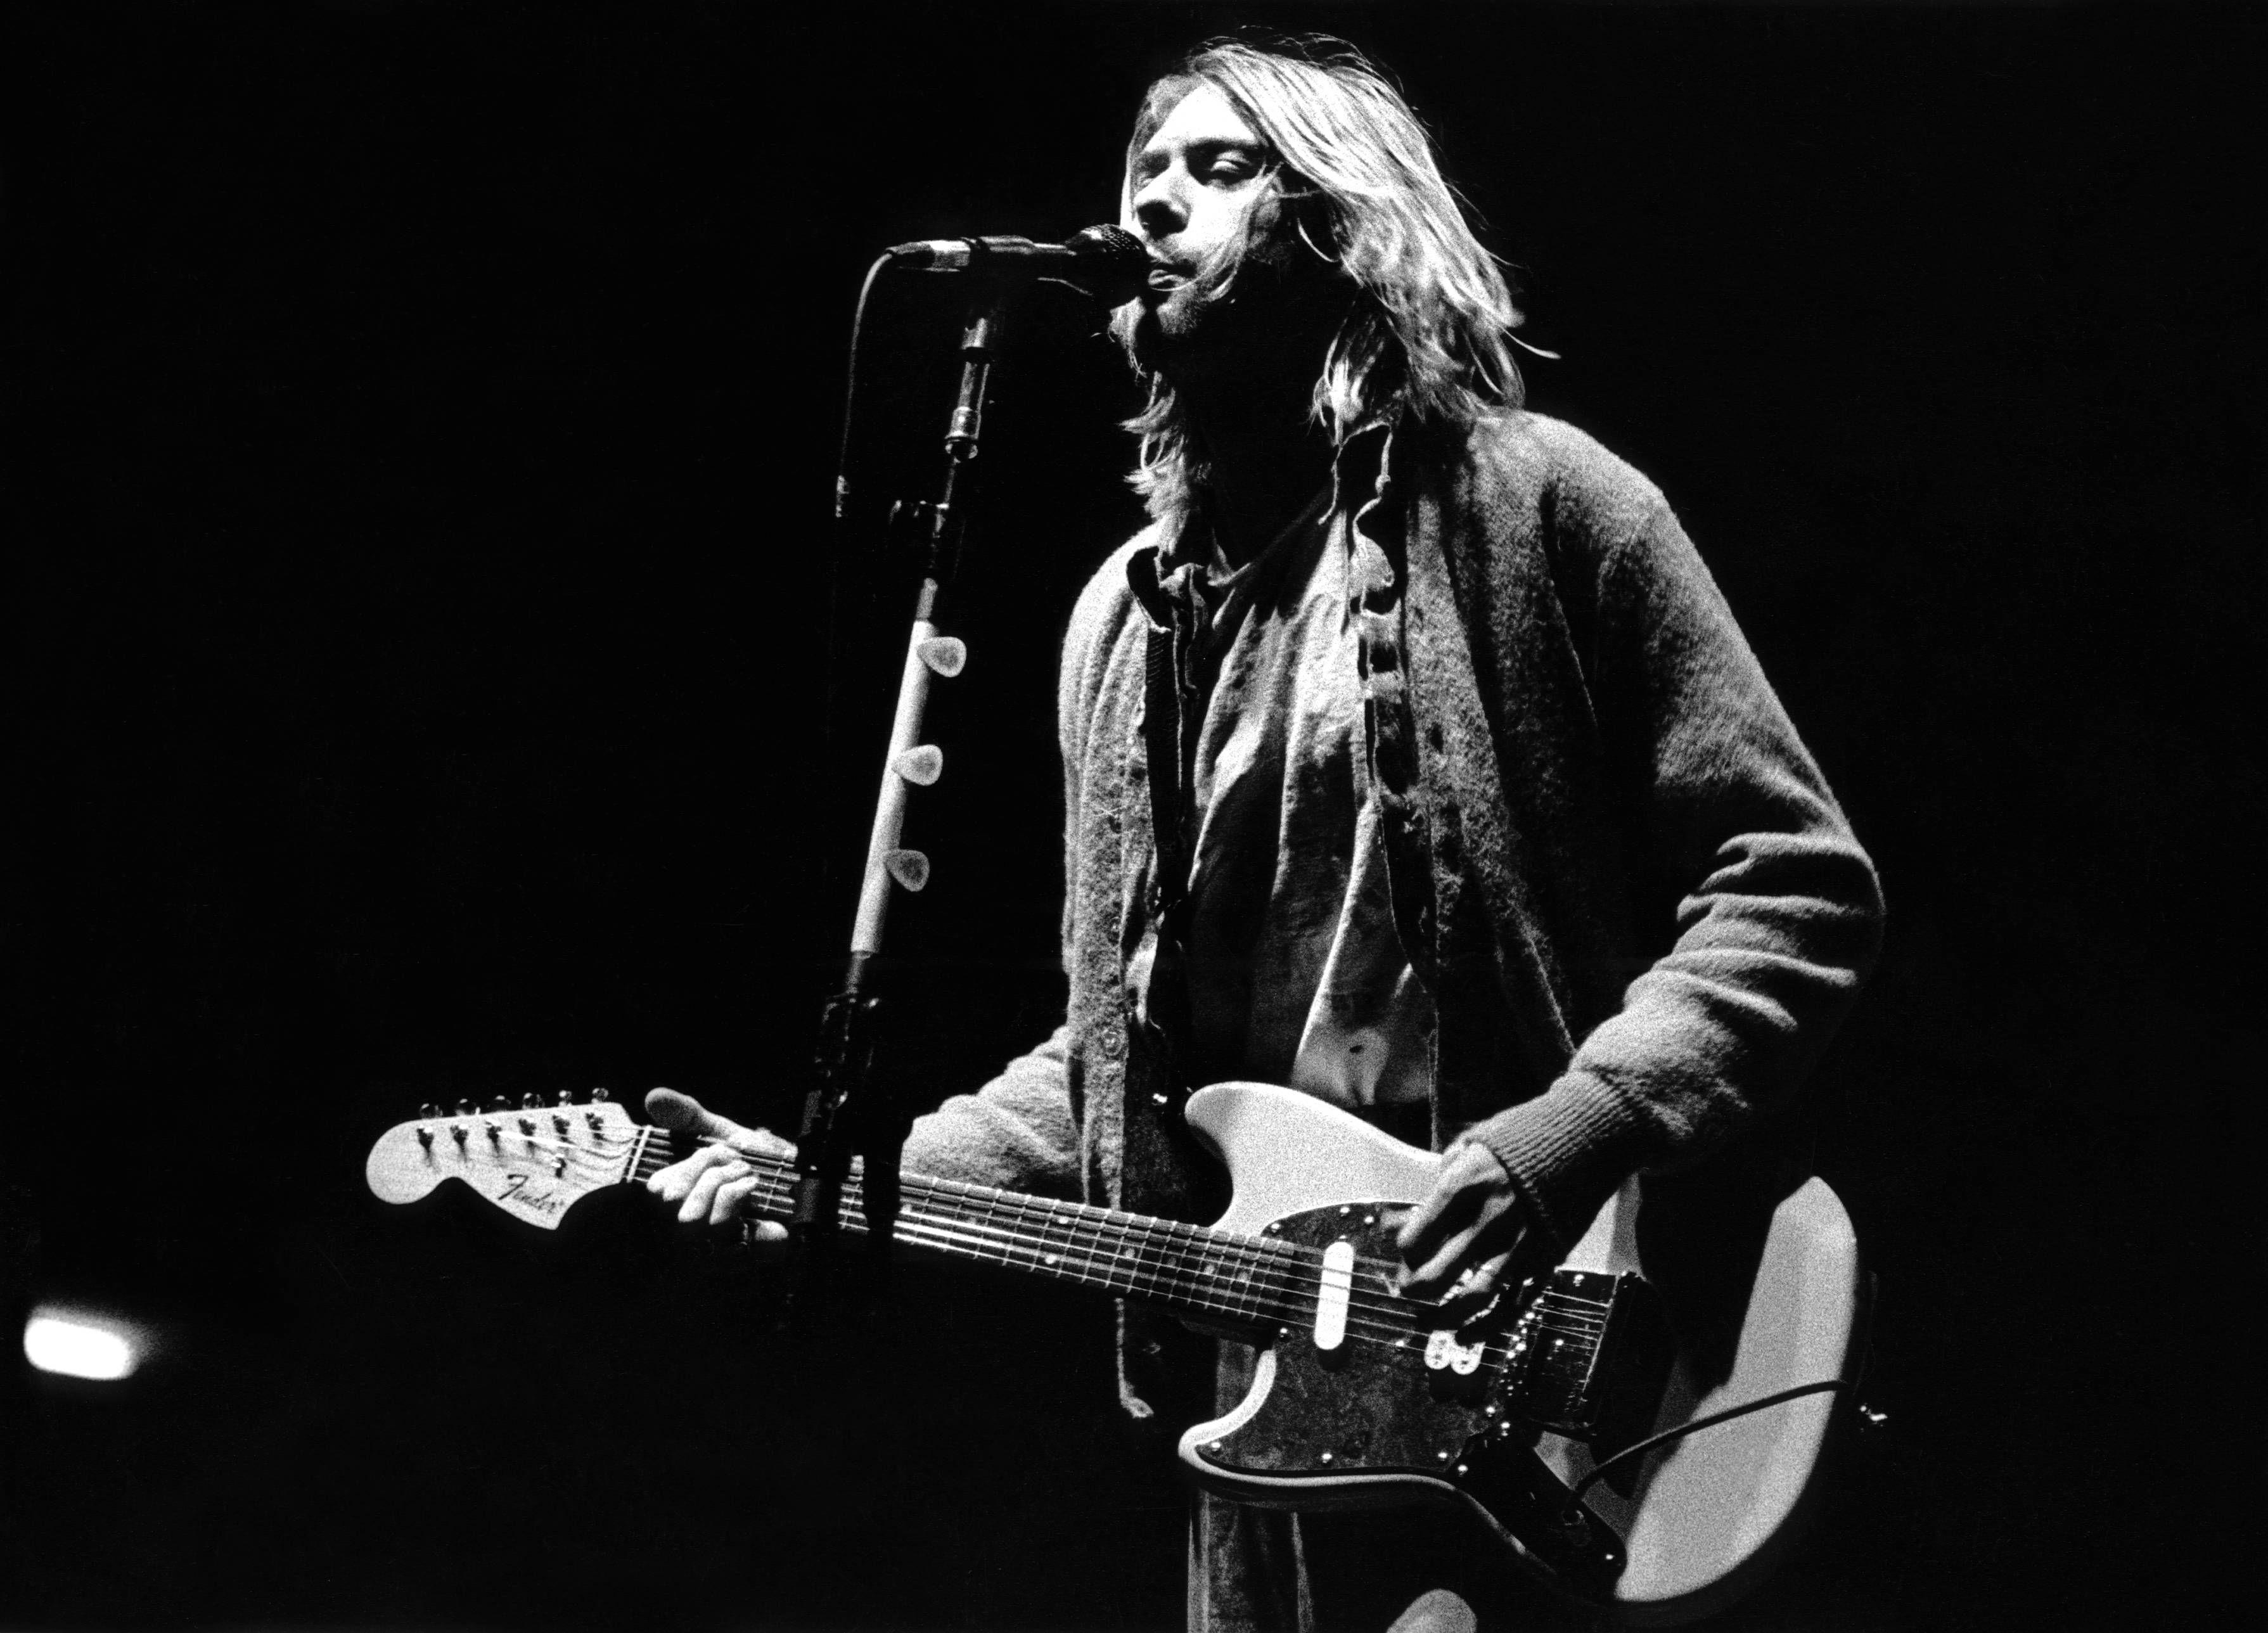 Kurt Cobain Backgrounds Wallpaper Guitare 3579x2577